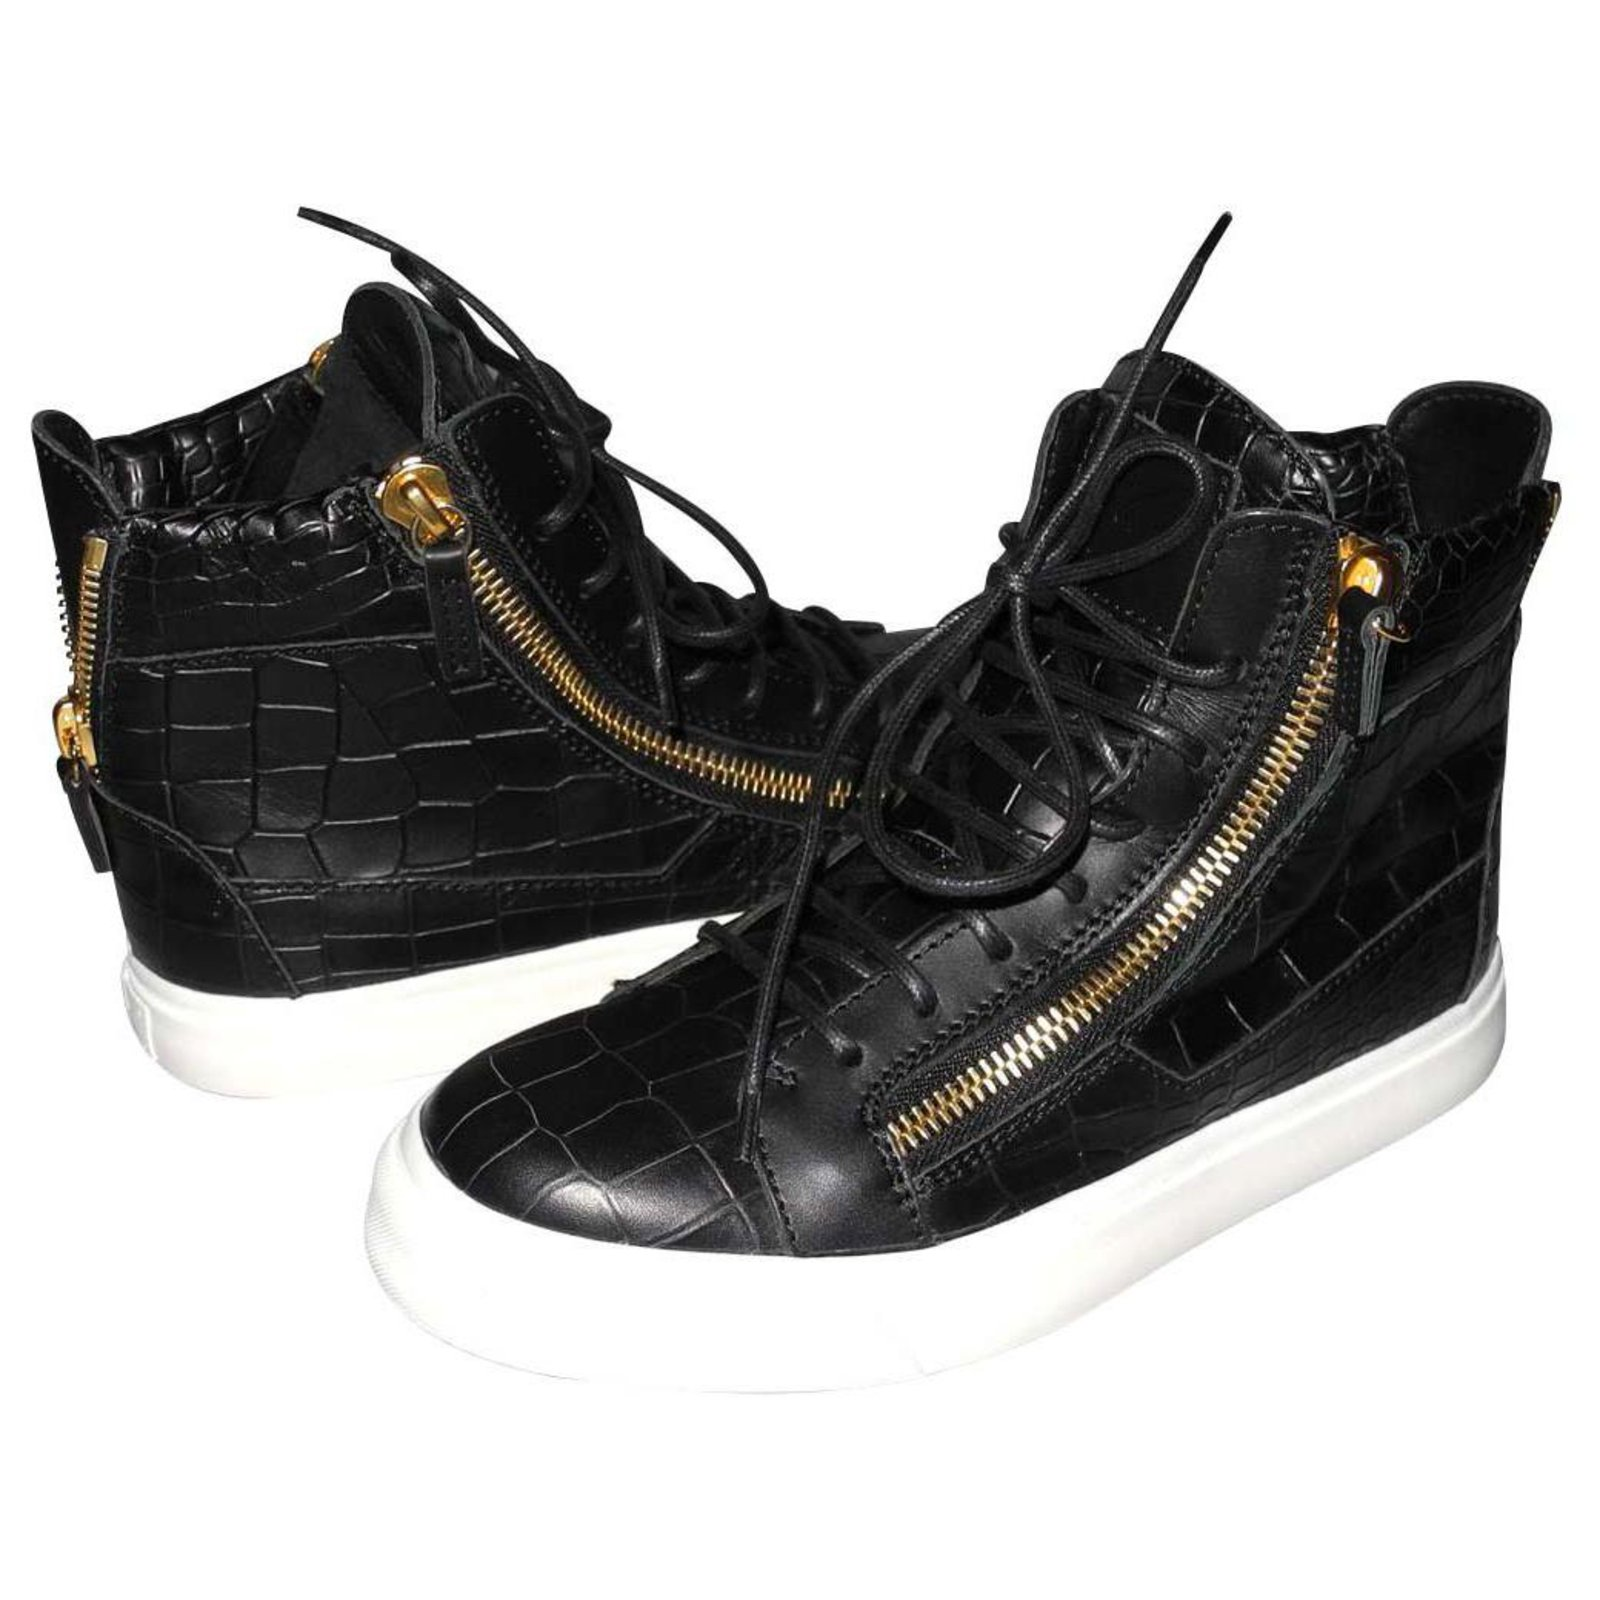 Giuseppe Zanotti sneakers Kriss black leather alligator